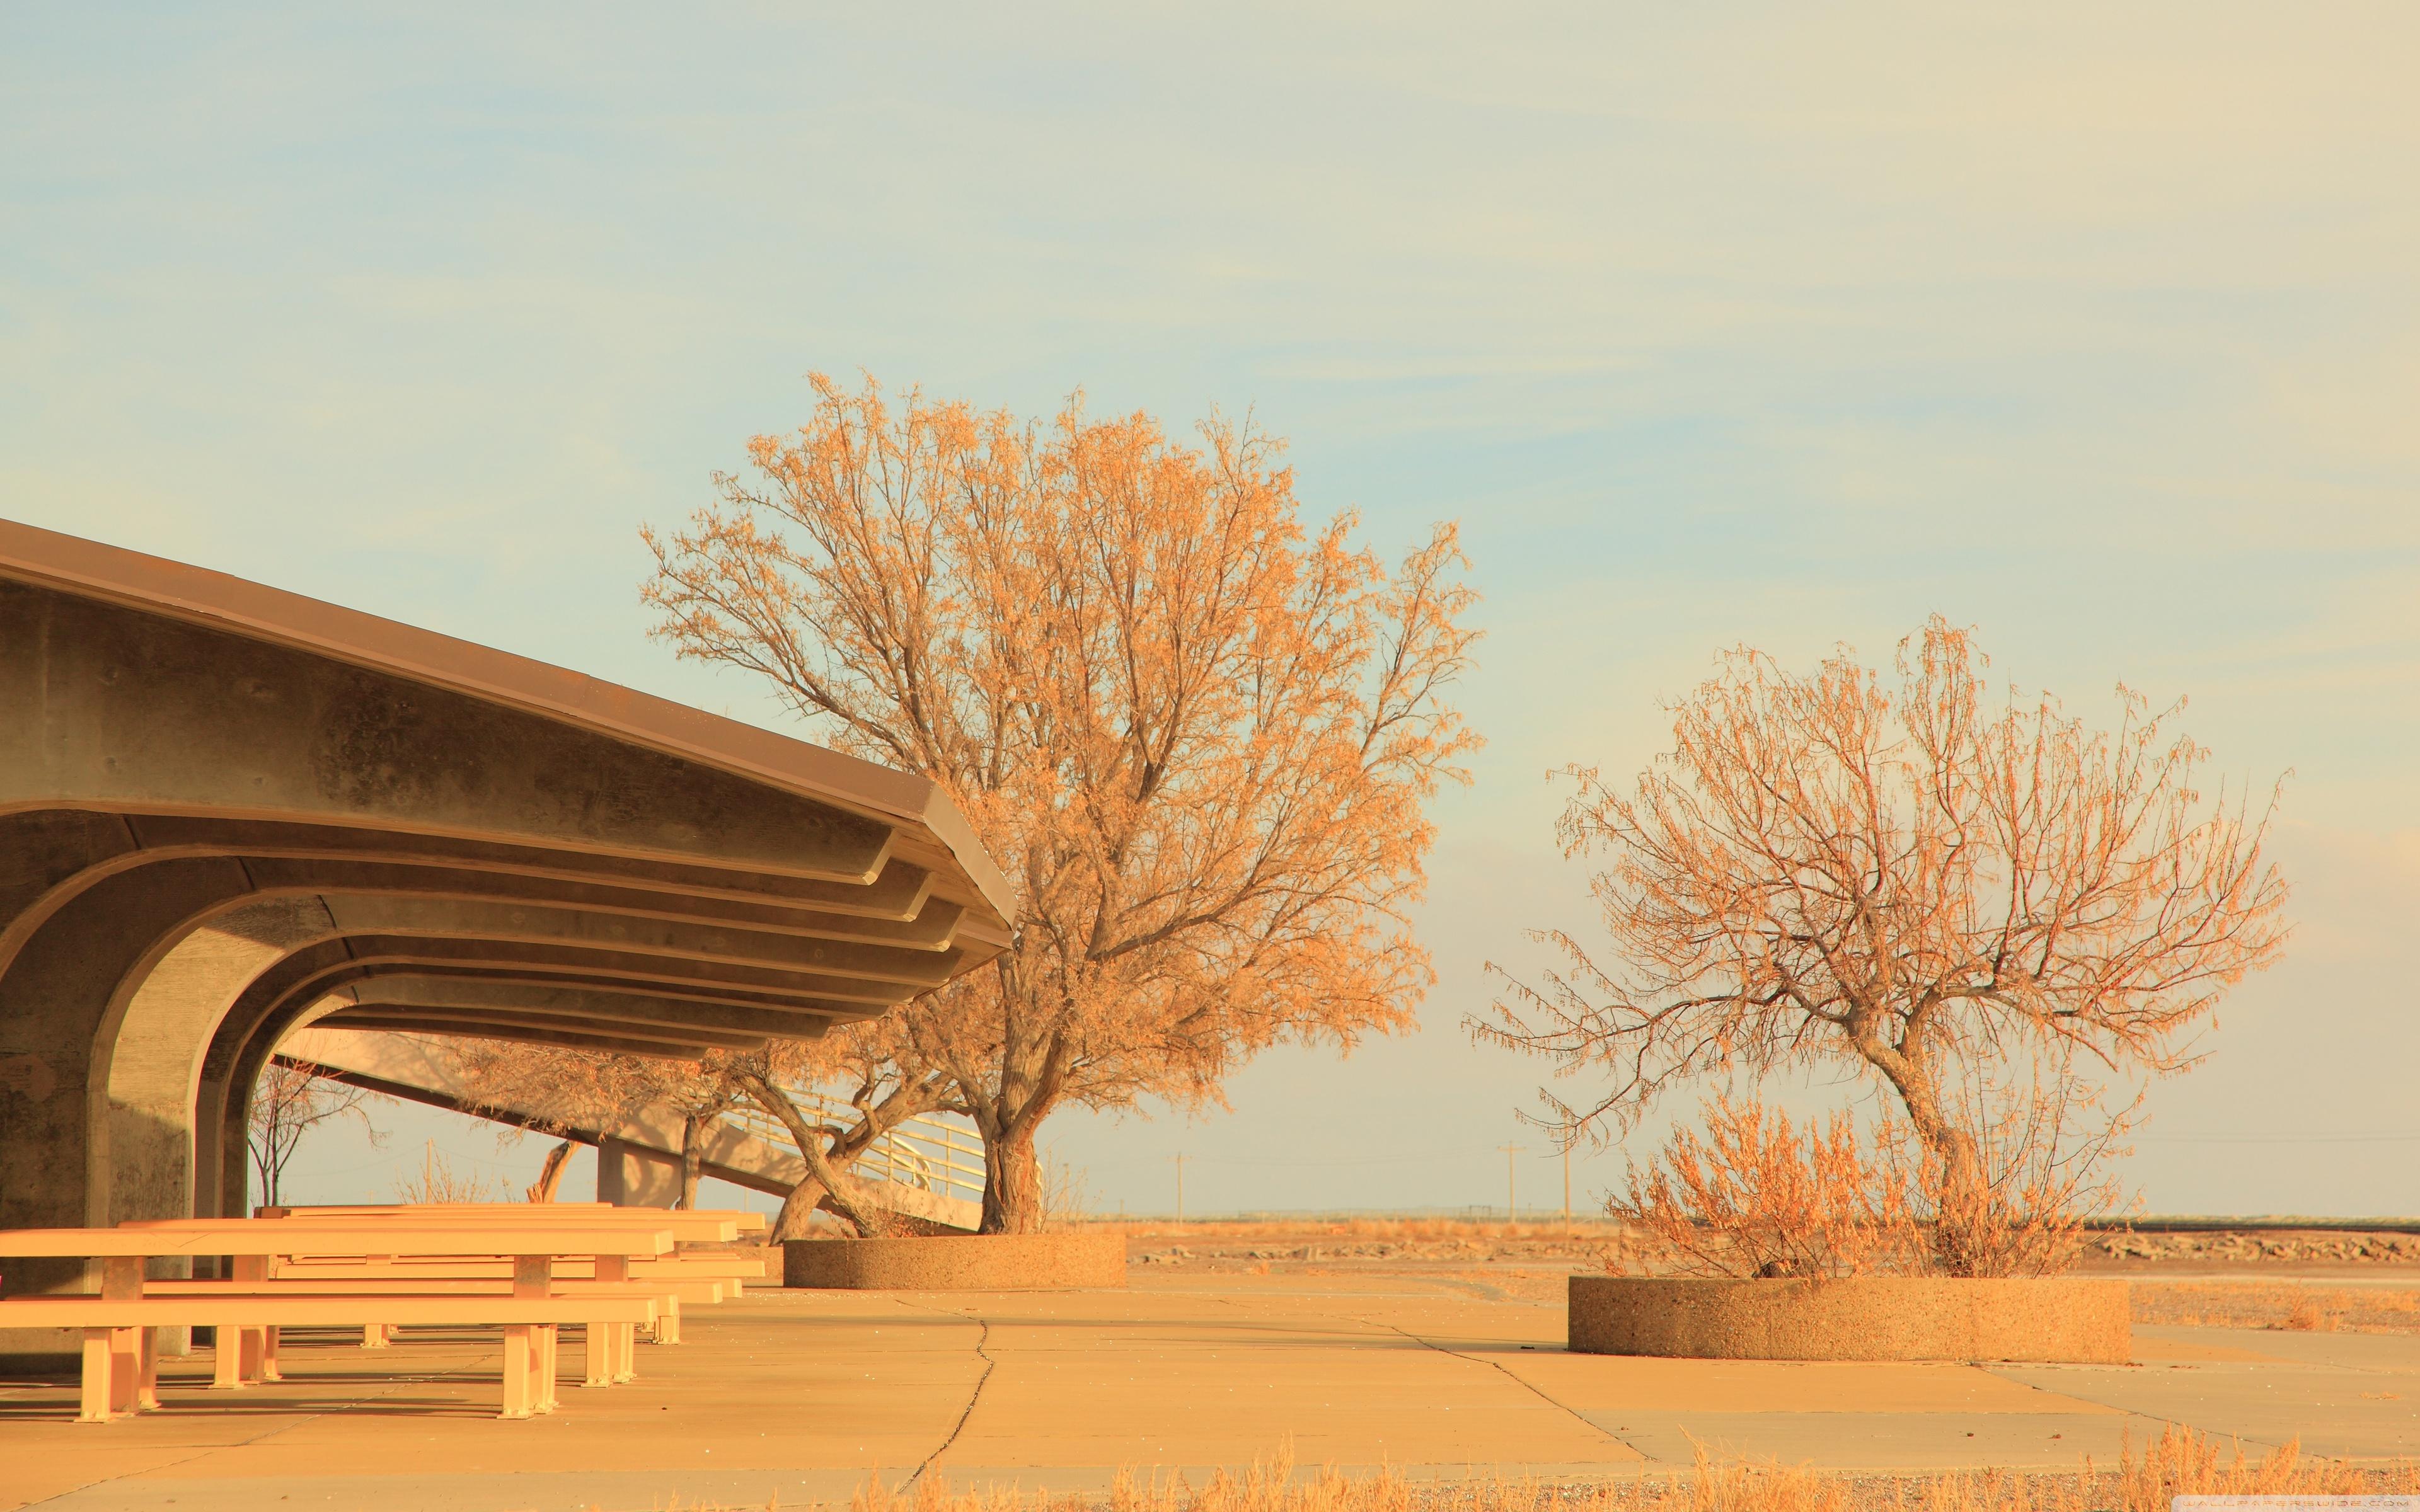 Bonneville Salt Flats Rest Area Utah 4K HD Desktop Wallpaper 3840x2400